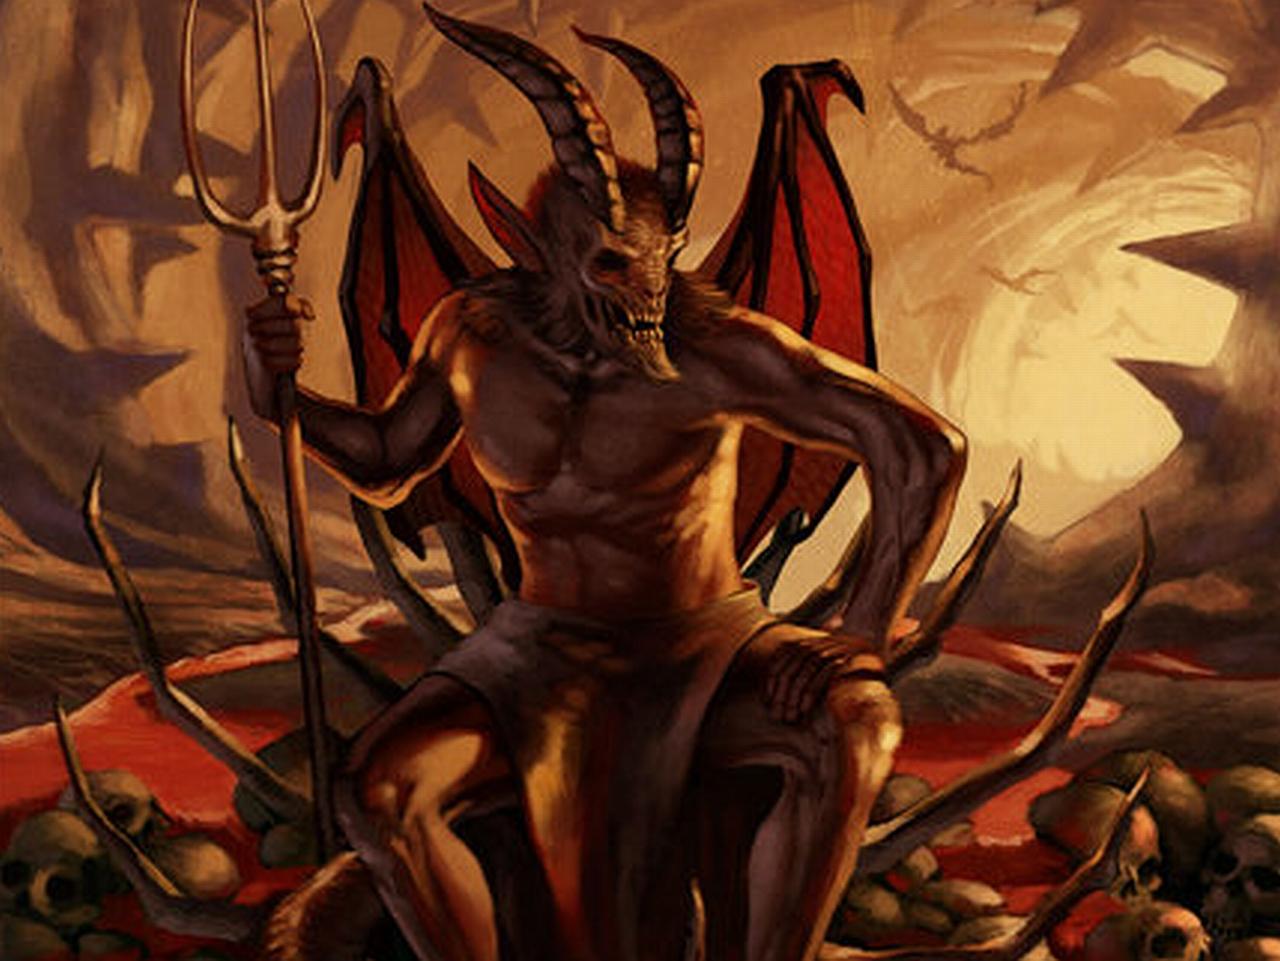 Dark Demon Wallpaper 1280x961 Dark Demon 1280x961